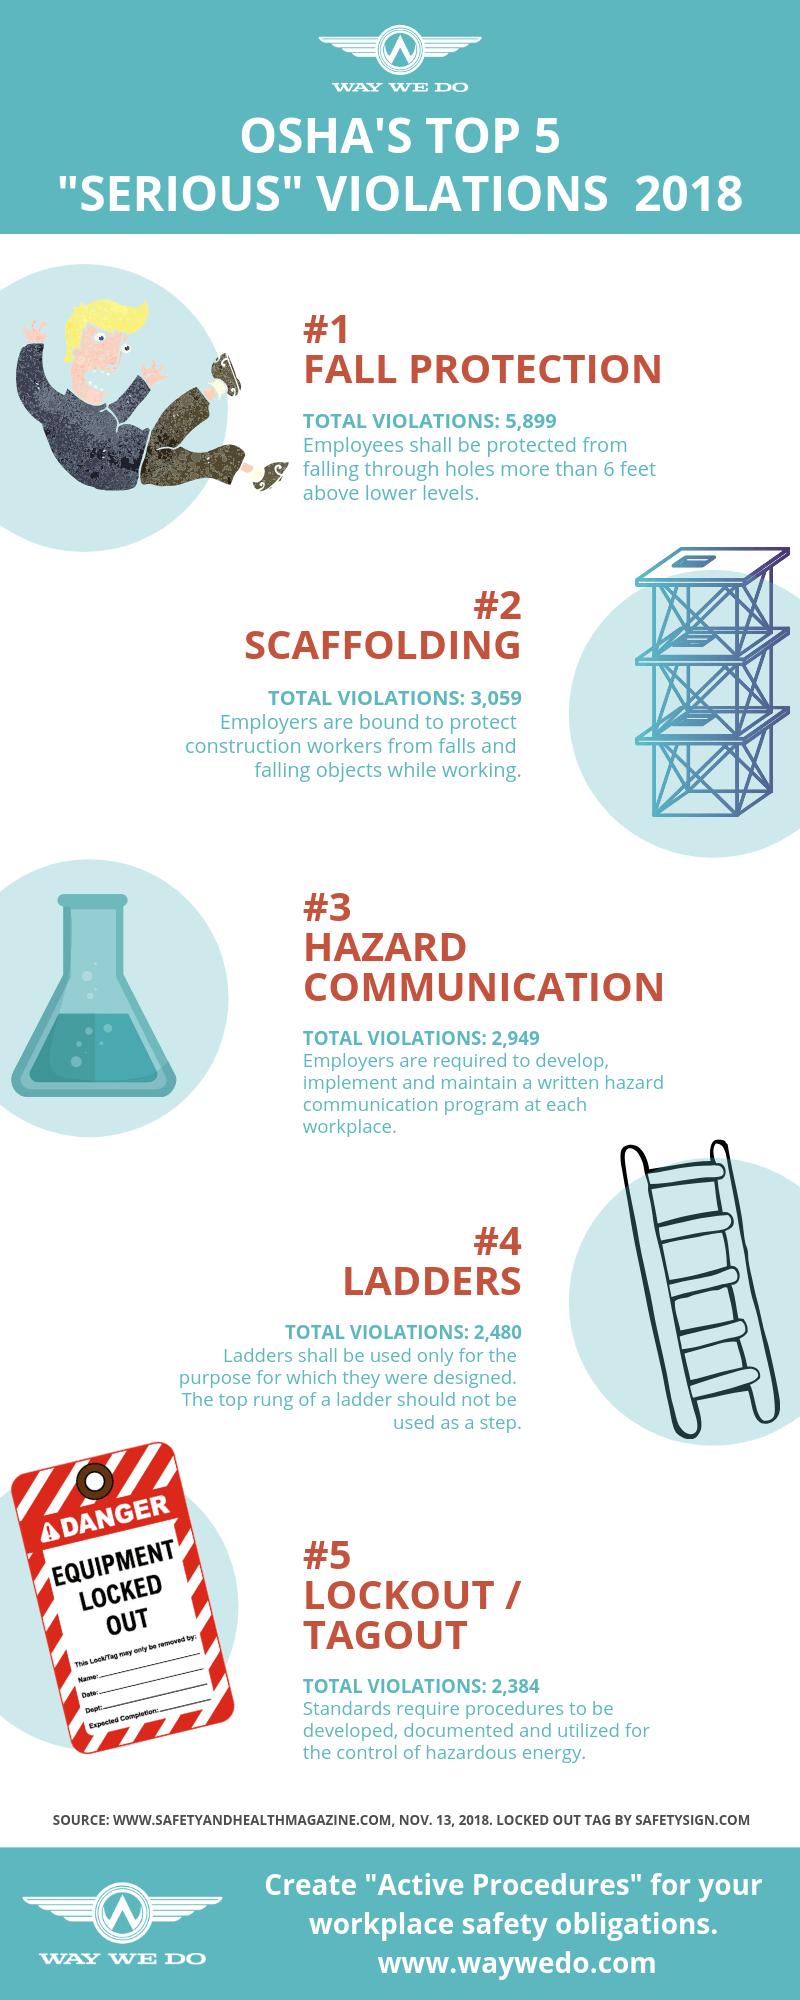 OSHA's Top 5 Serious Violations 2018